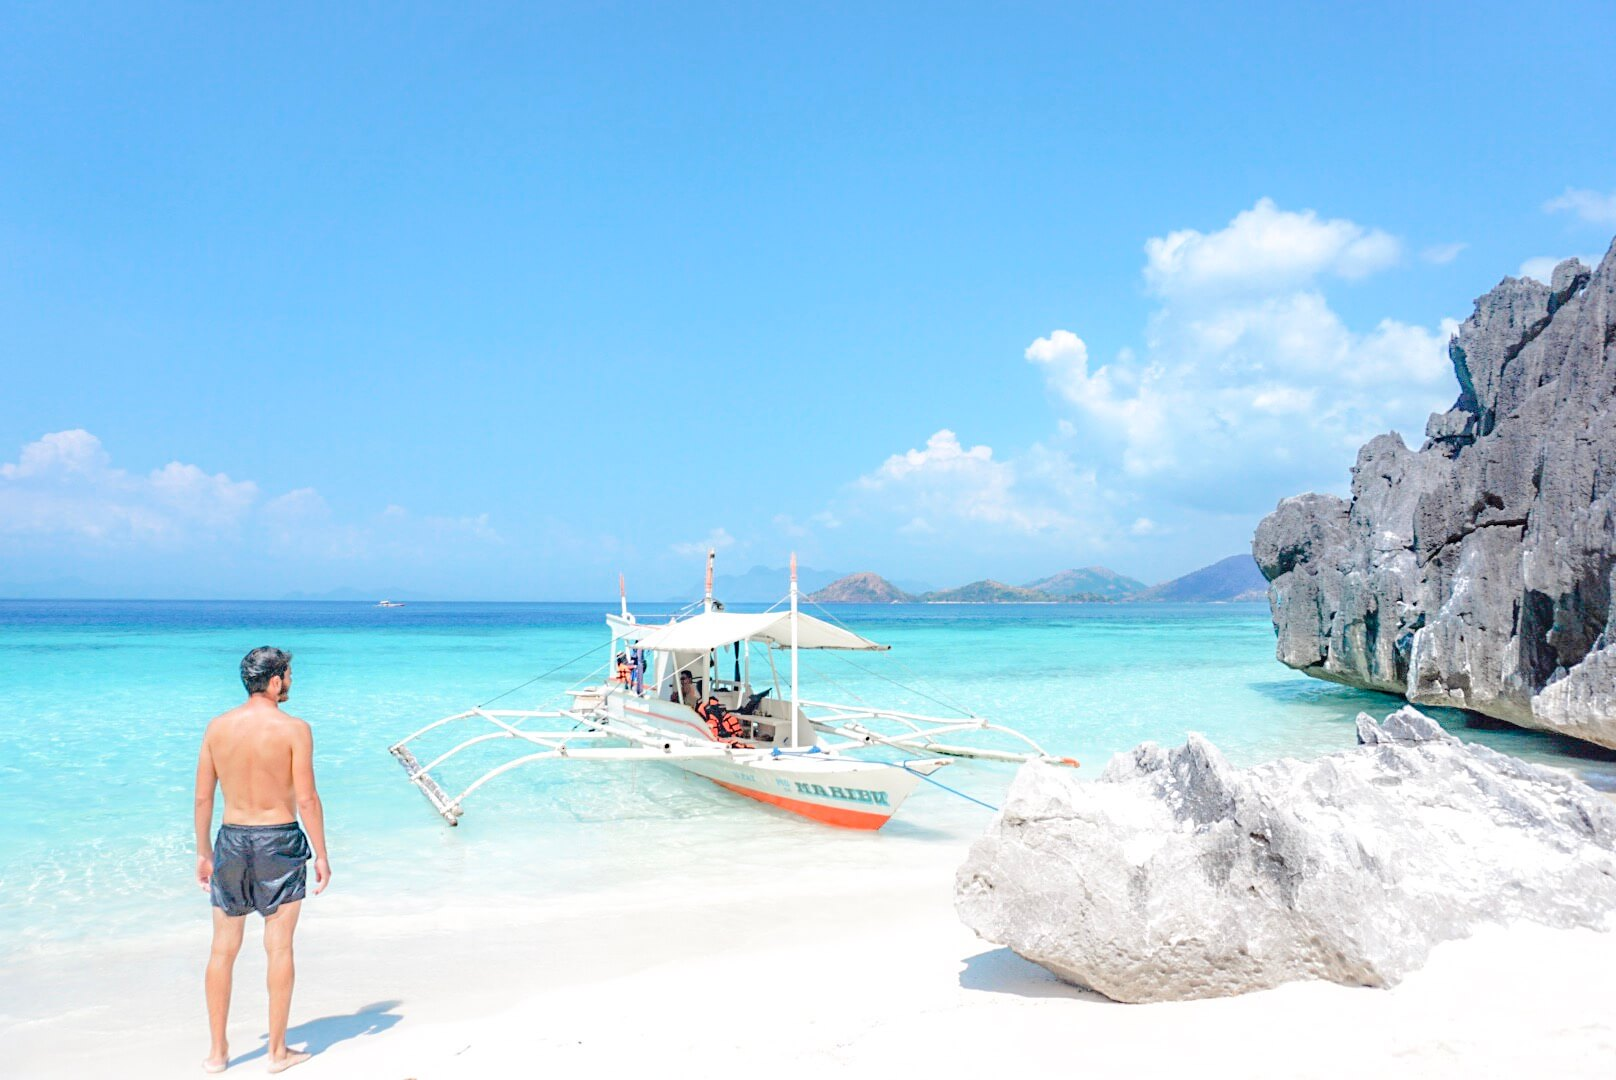 Island Hopping Banol beach Coron Philippines